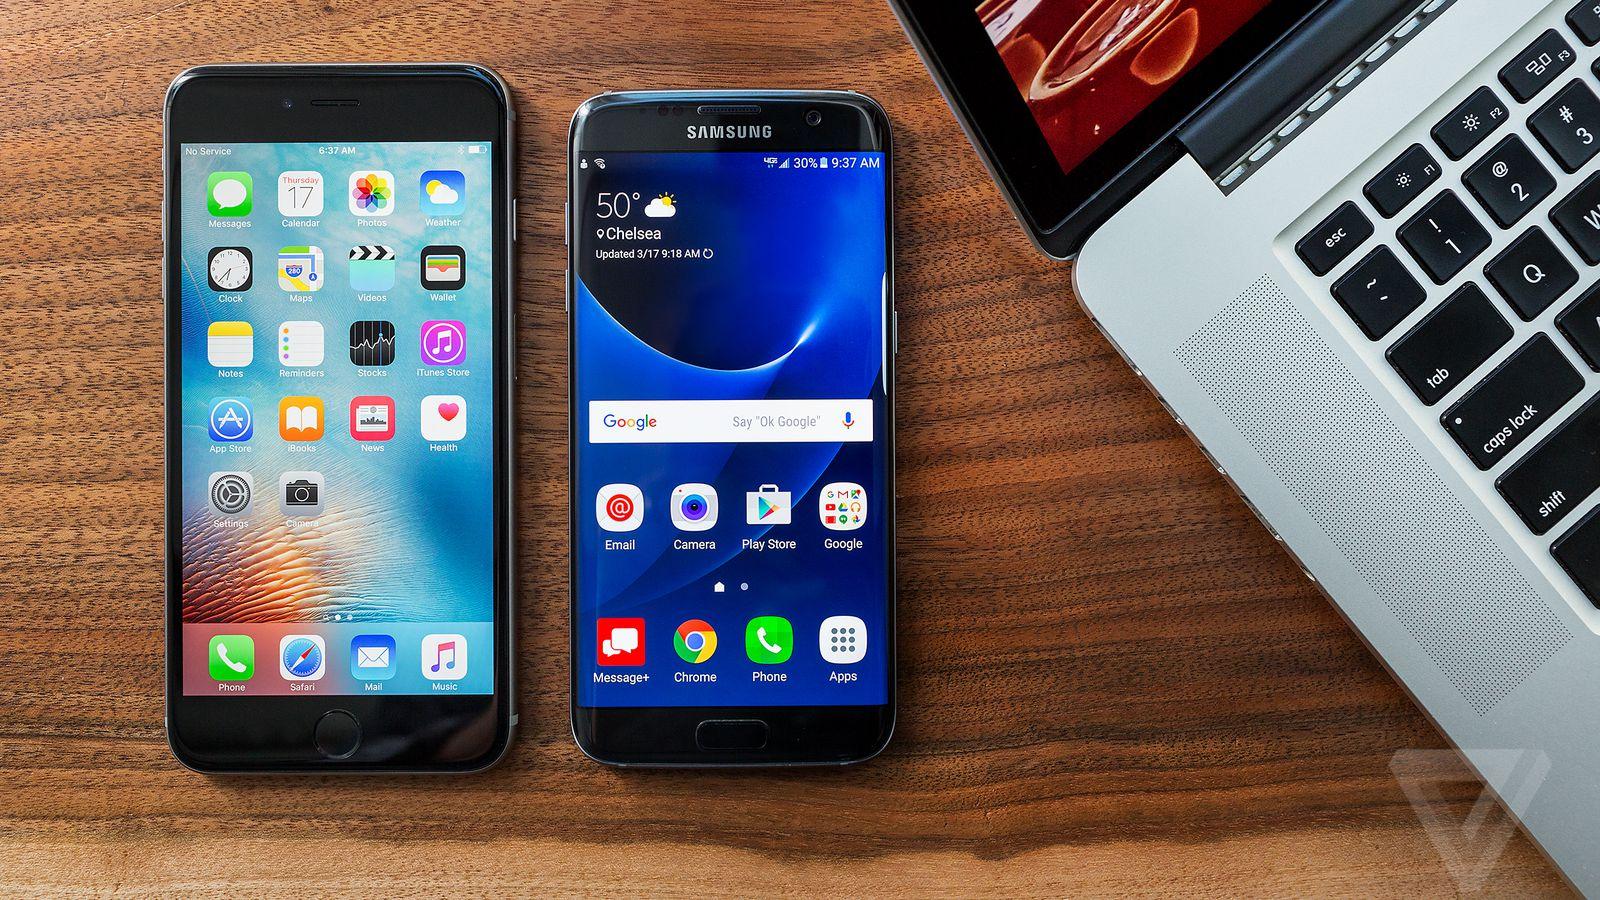 iphone 7 plus vs samsung galaxy s7 edge camera